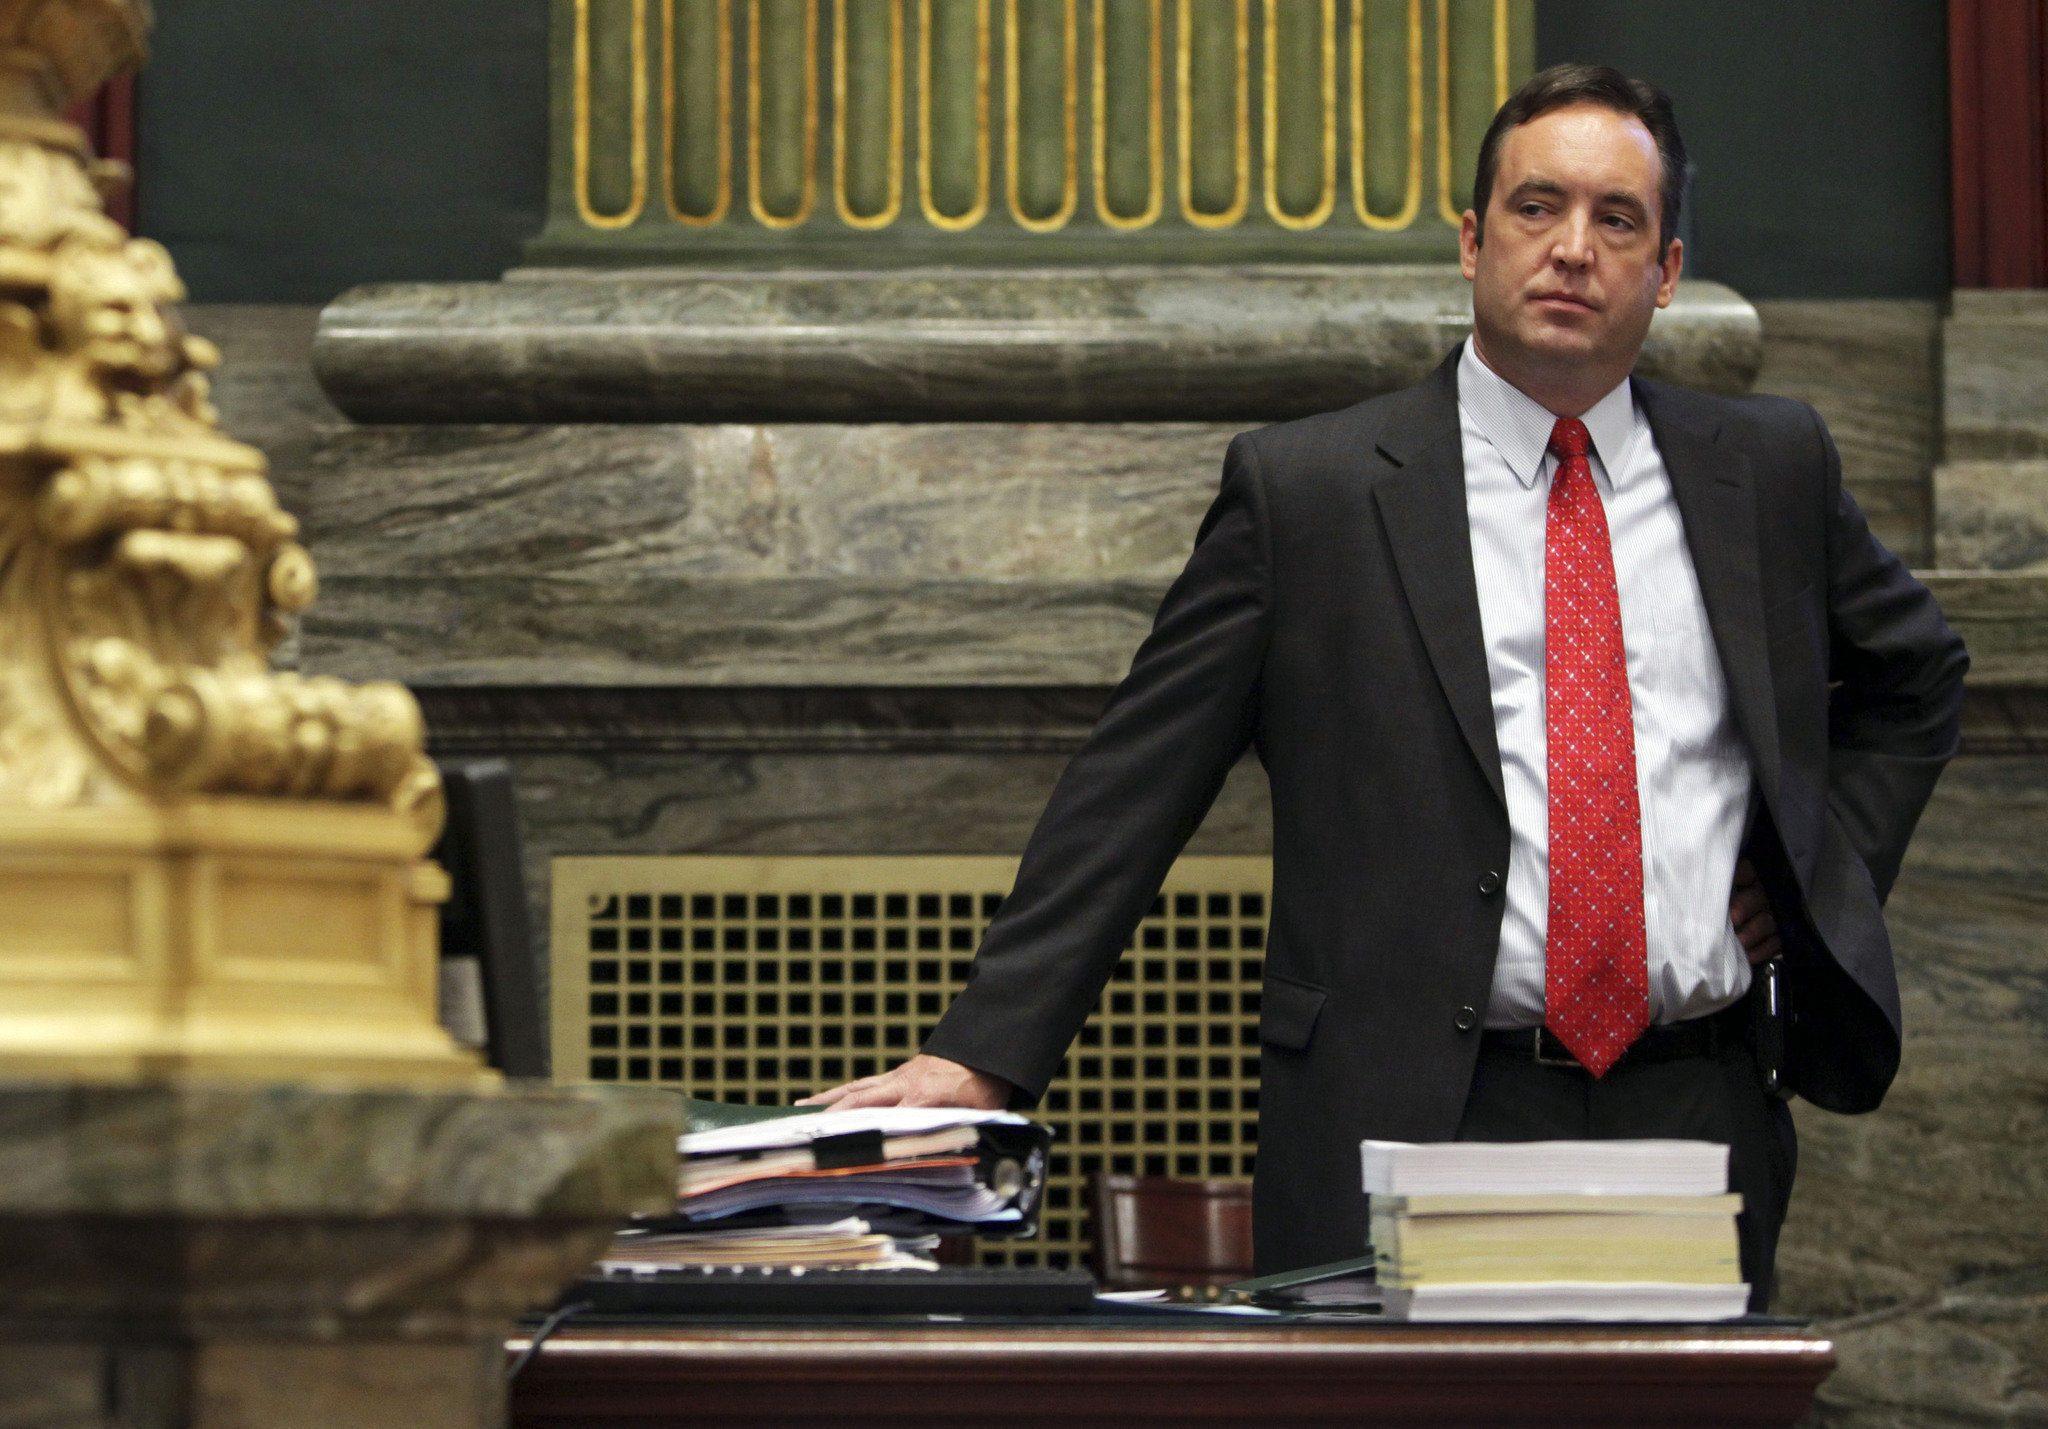 Pennsylvania expanded gambling Jake Corman